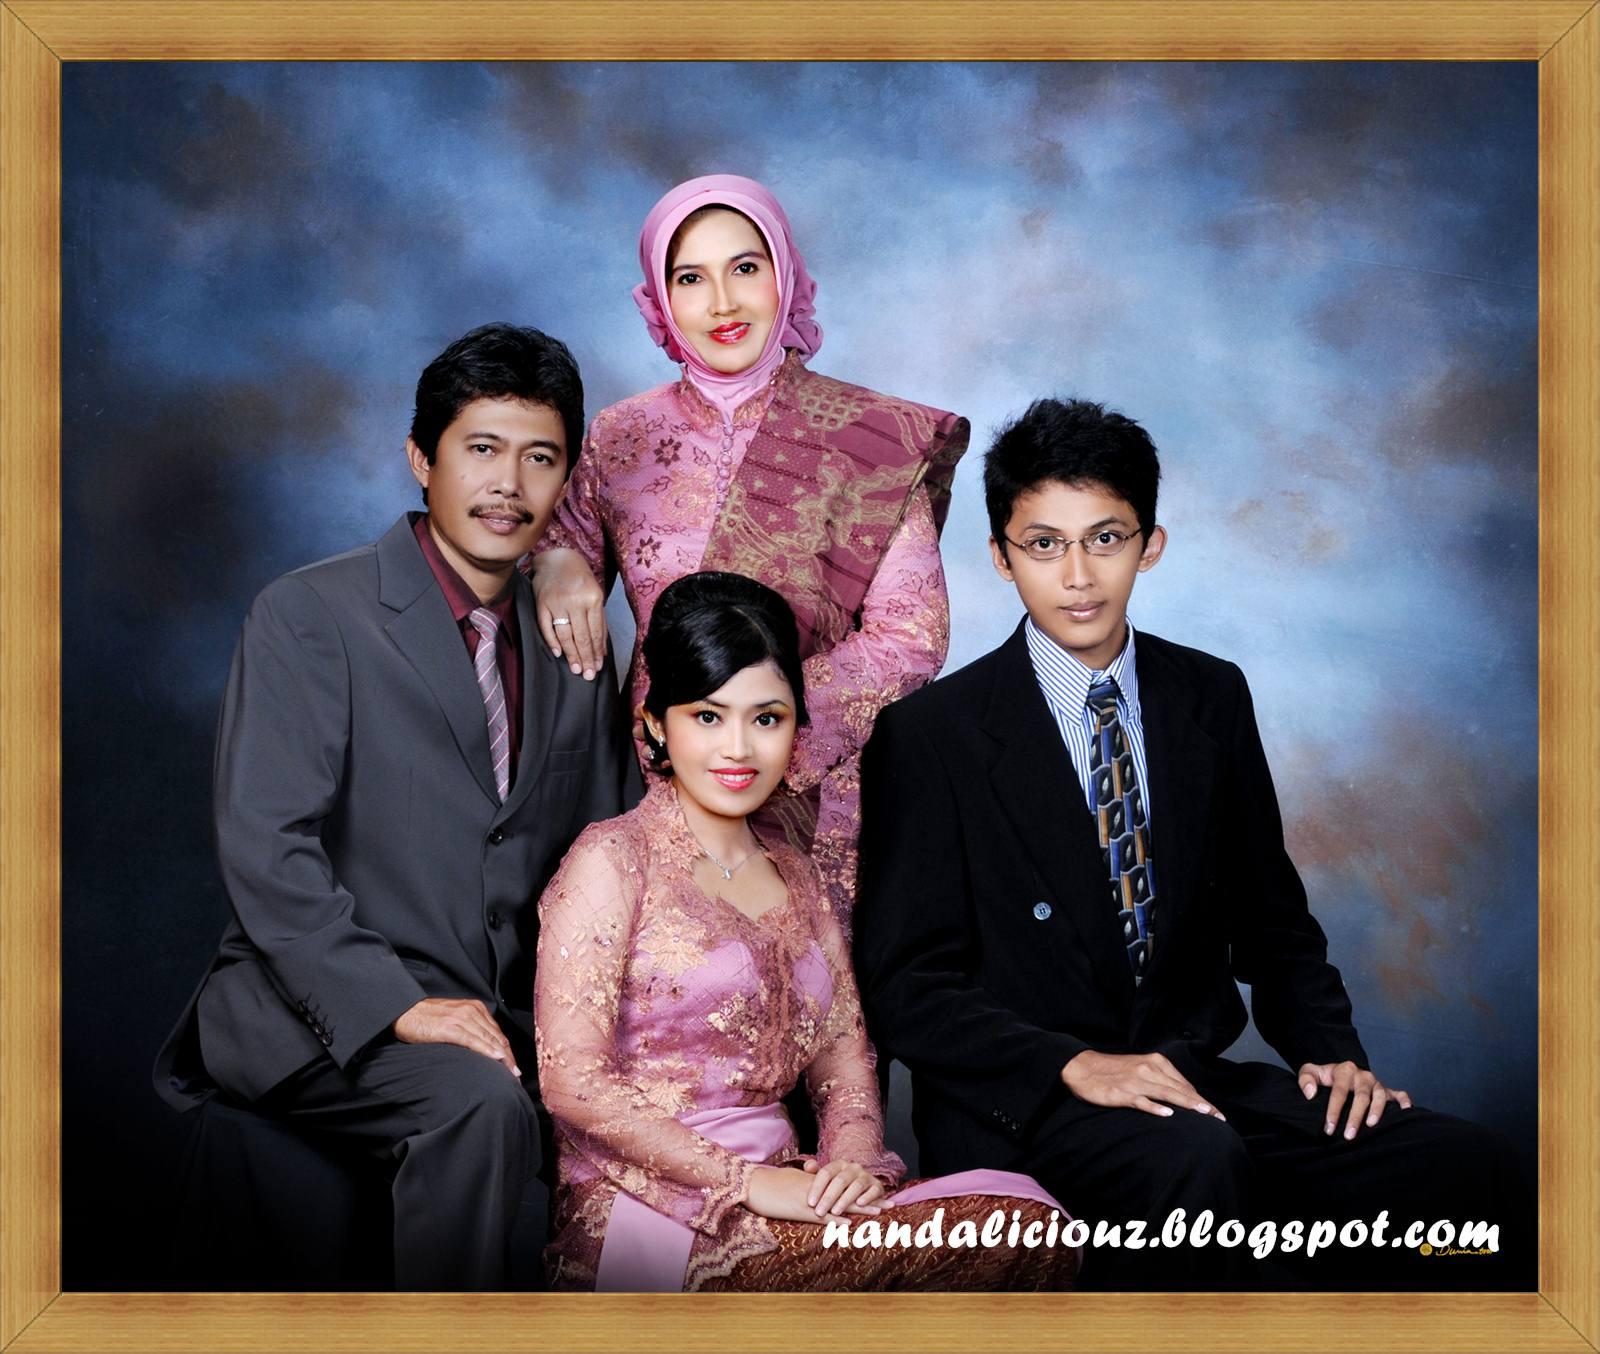 Foto Wisuda Keluarga Kumpulan Berita Up To Date